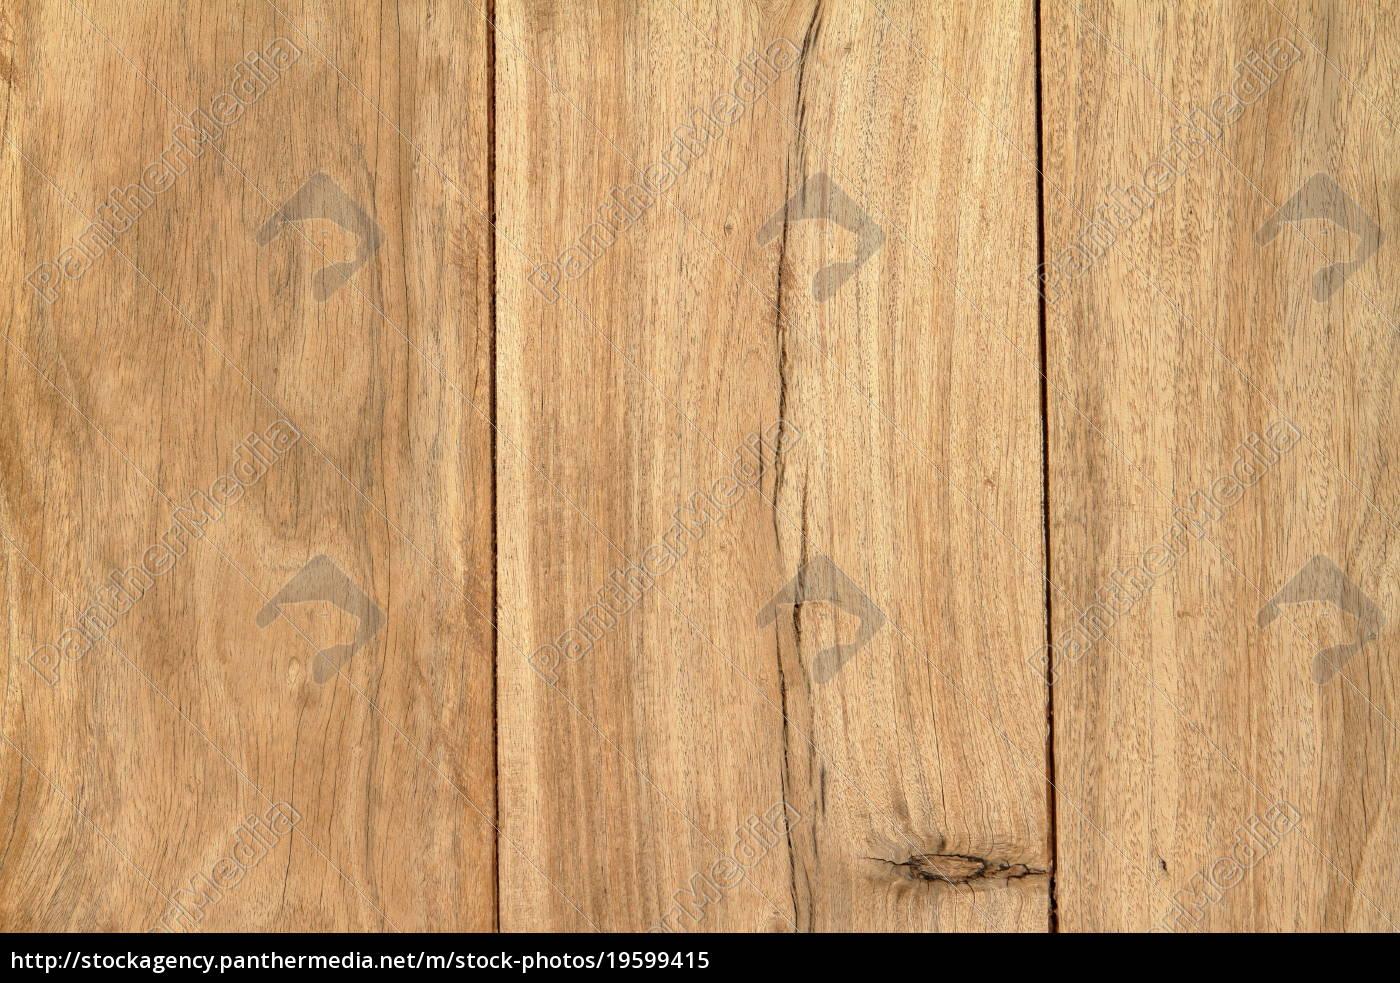 rustikaler holz hintergrund lizenzfreies bild 19599415 bildagentur panthermedia. Black Bedroom Furniture Sets. Home Design Ideas